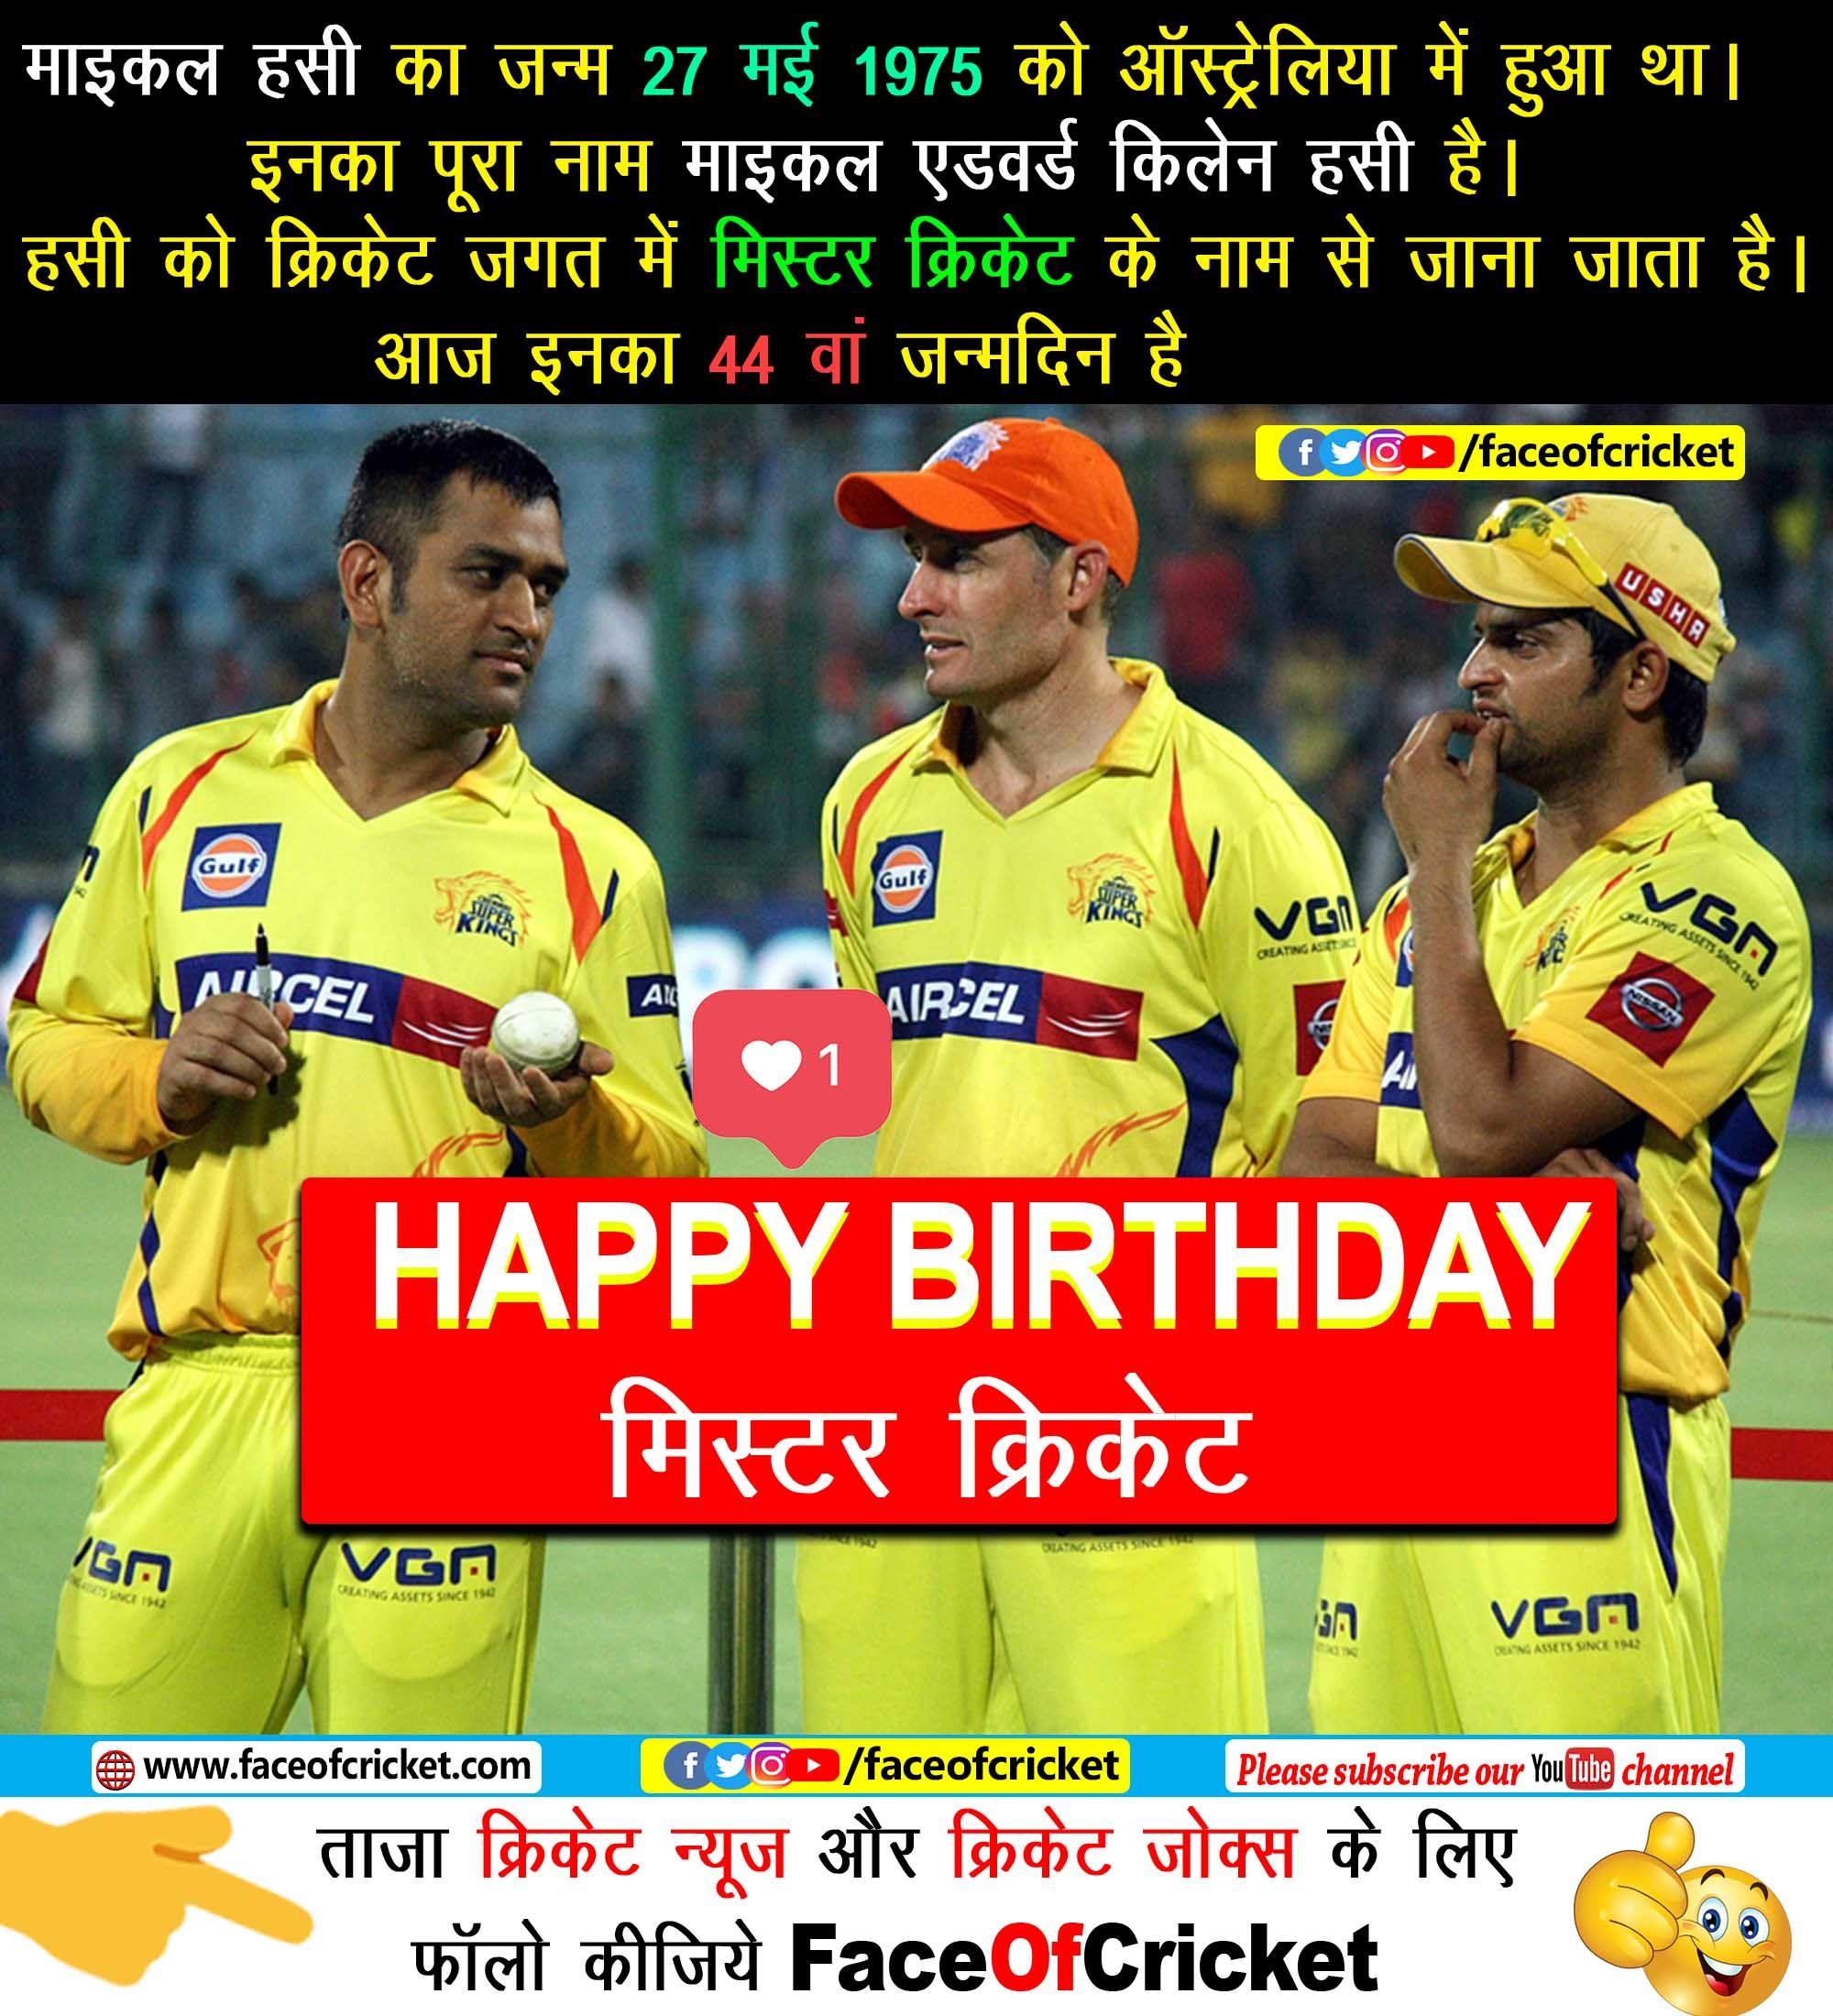 wish you a very very happy birthday mr. cricket